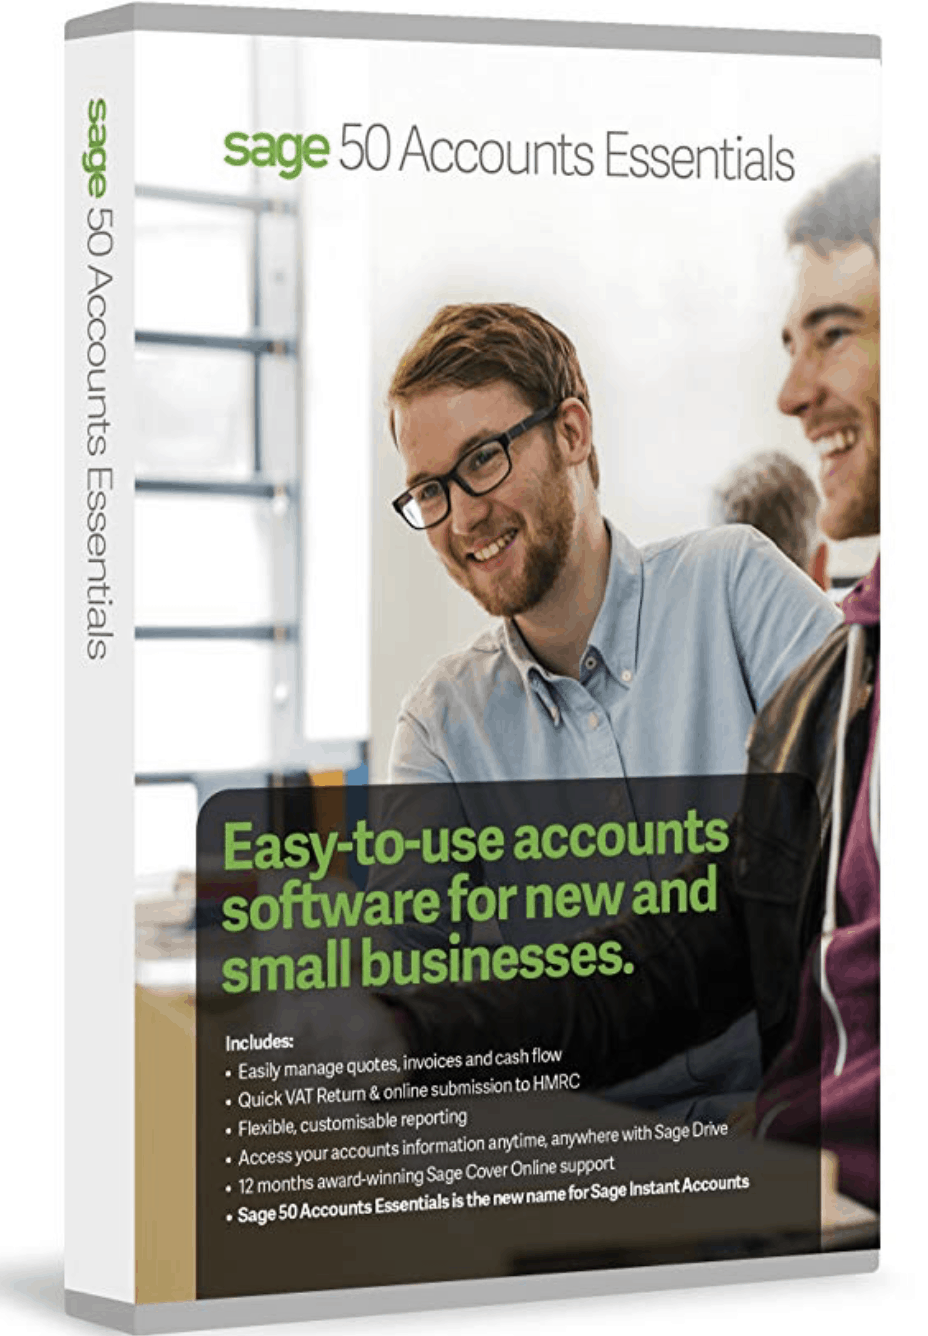 Sage 50 Accounts Essentials Software